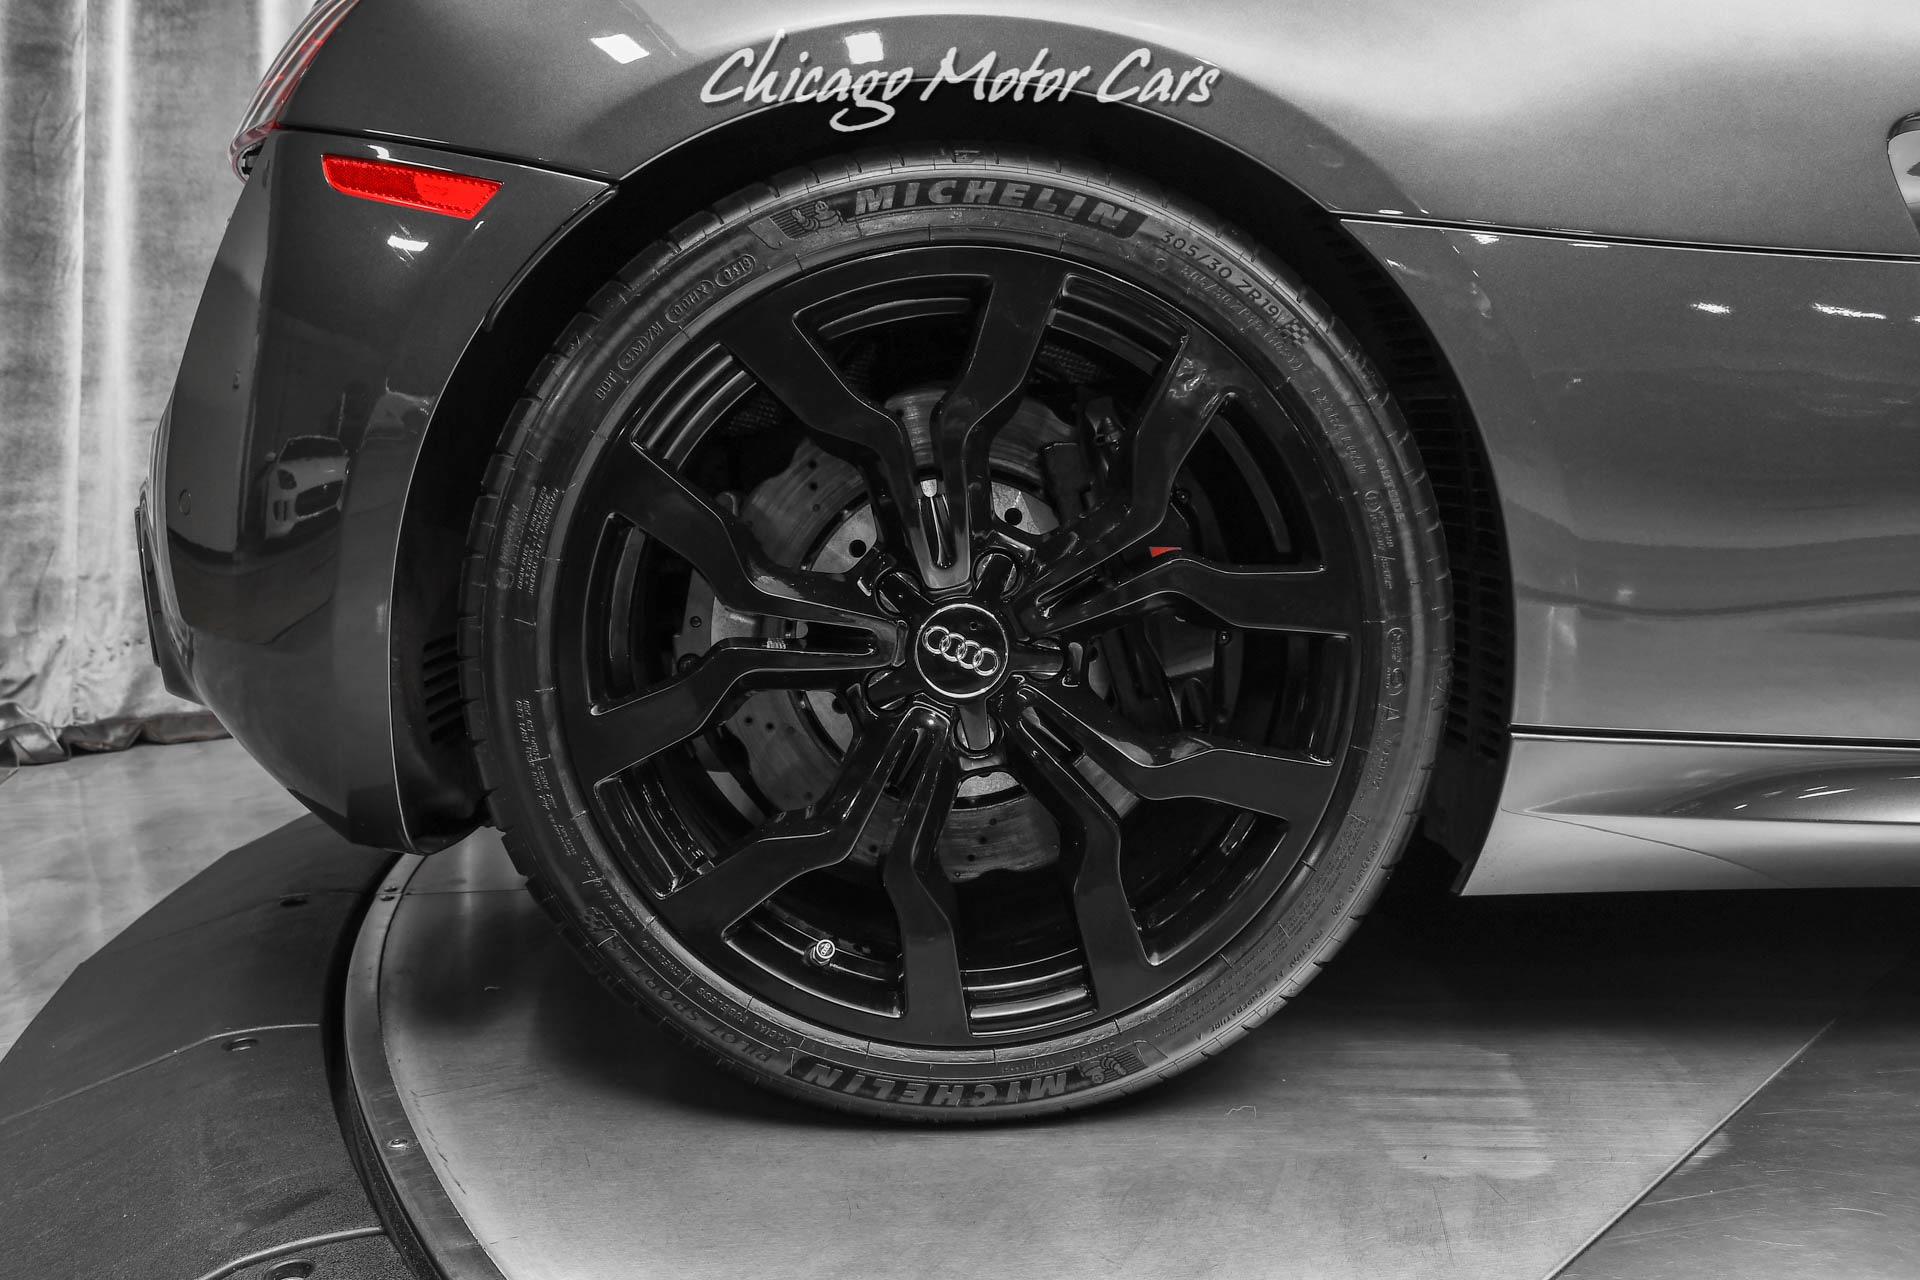 Used-2015-Audi-R8-52L-V10-52-quattro-Carbon-Spyder-Carbon-Fiber-Audi-Exclusive-Optics-LOADED